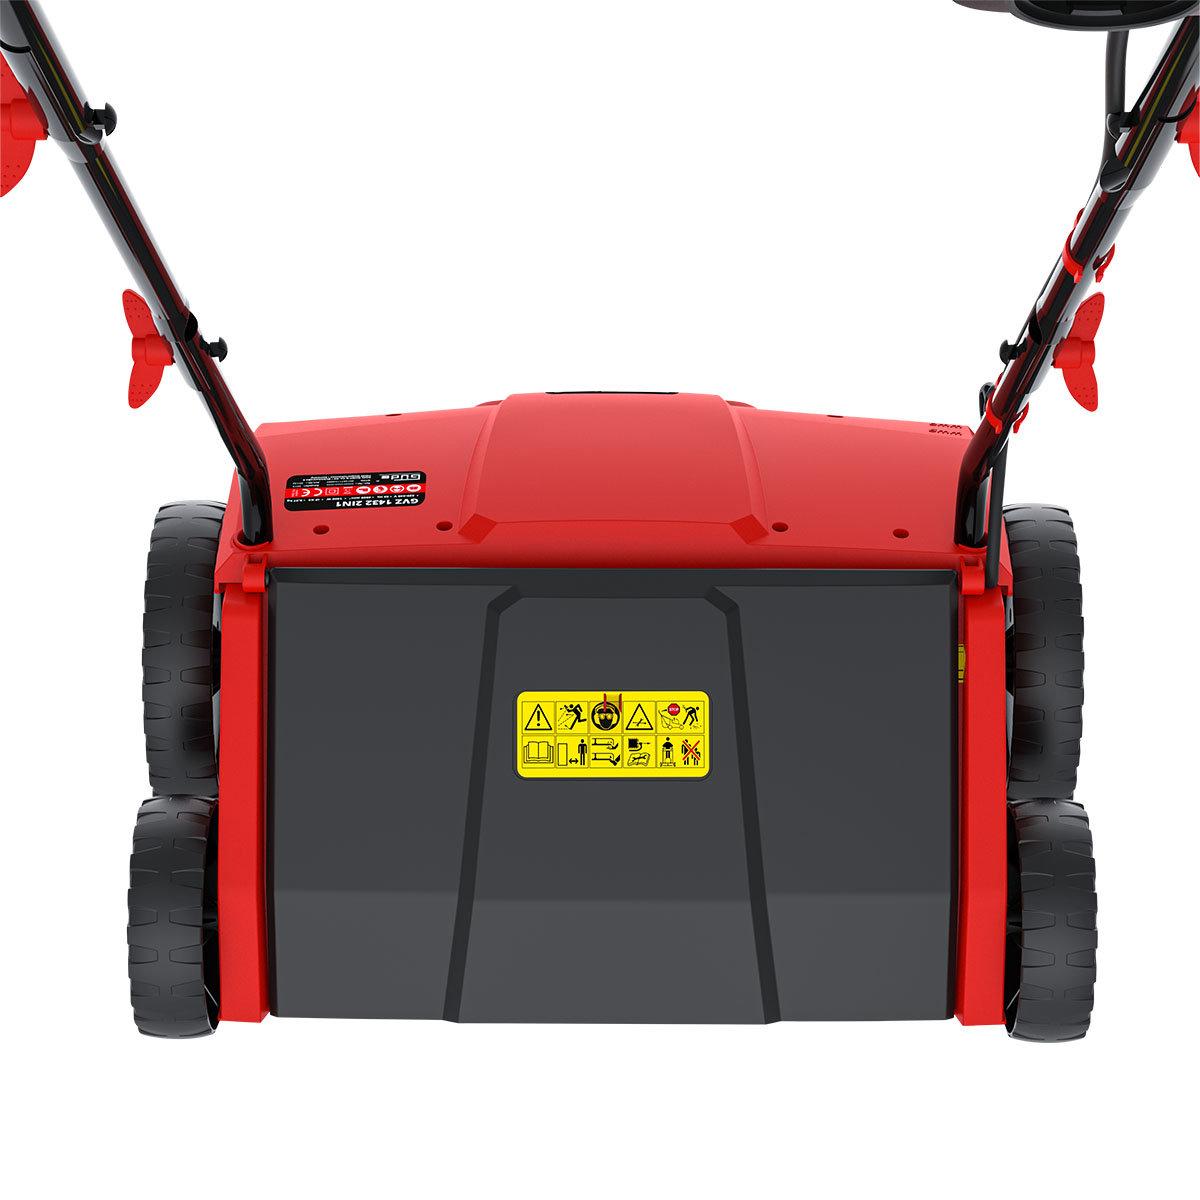 Elektro-Vertikutierer GVZ 1432 2in1 | #4